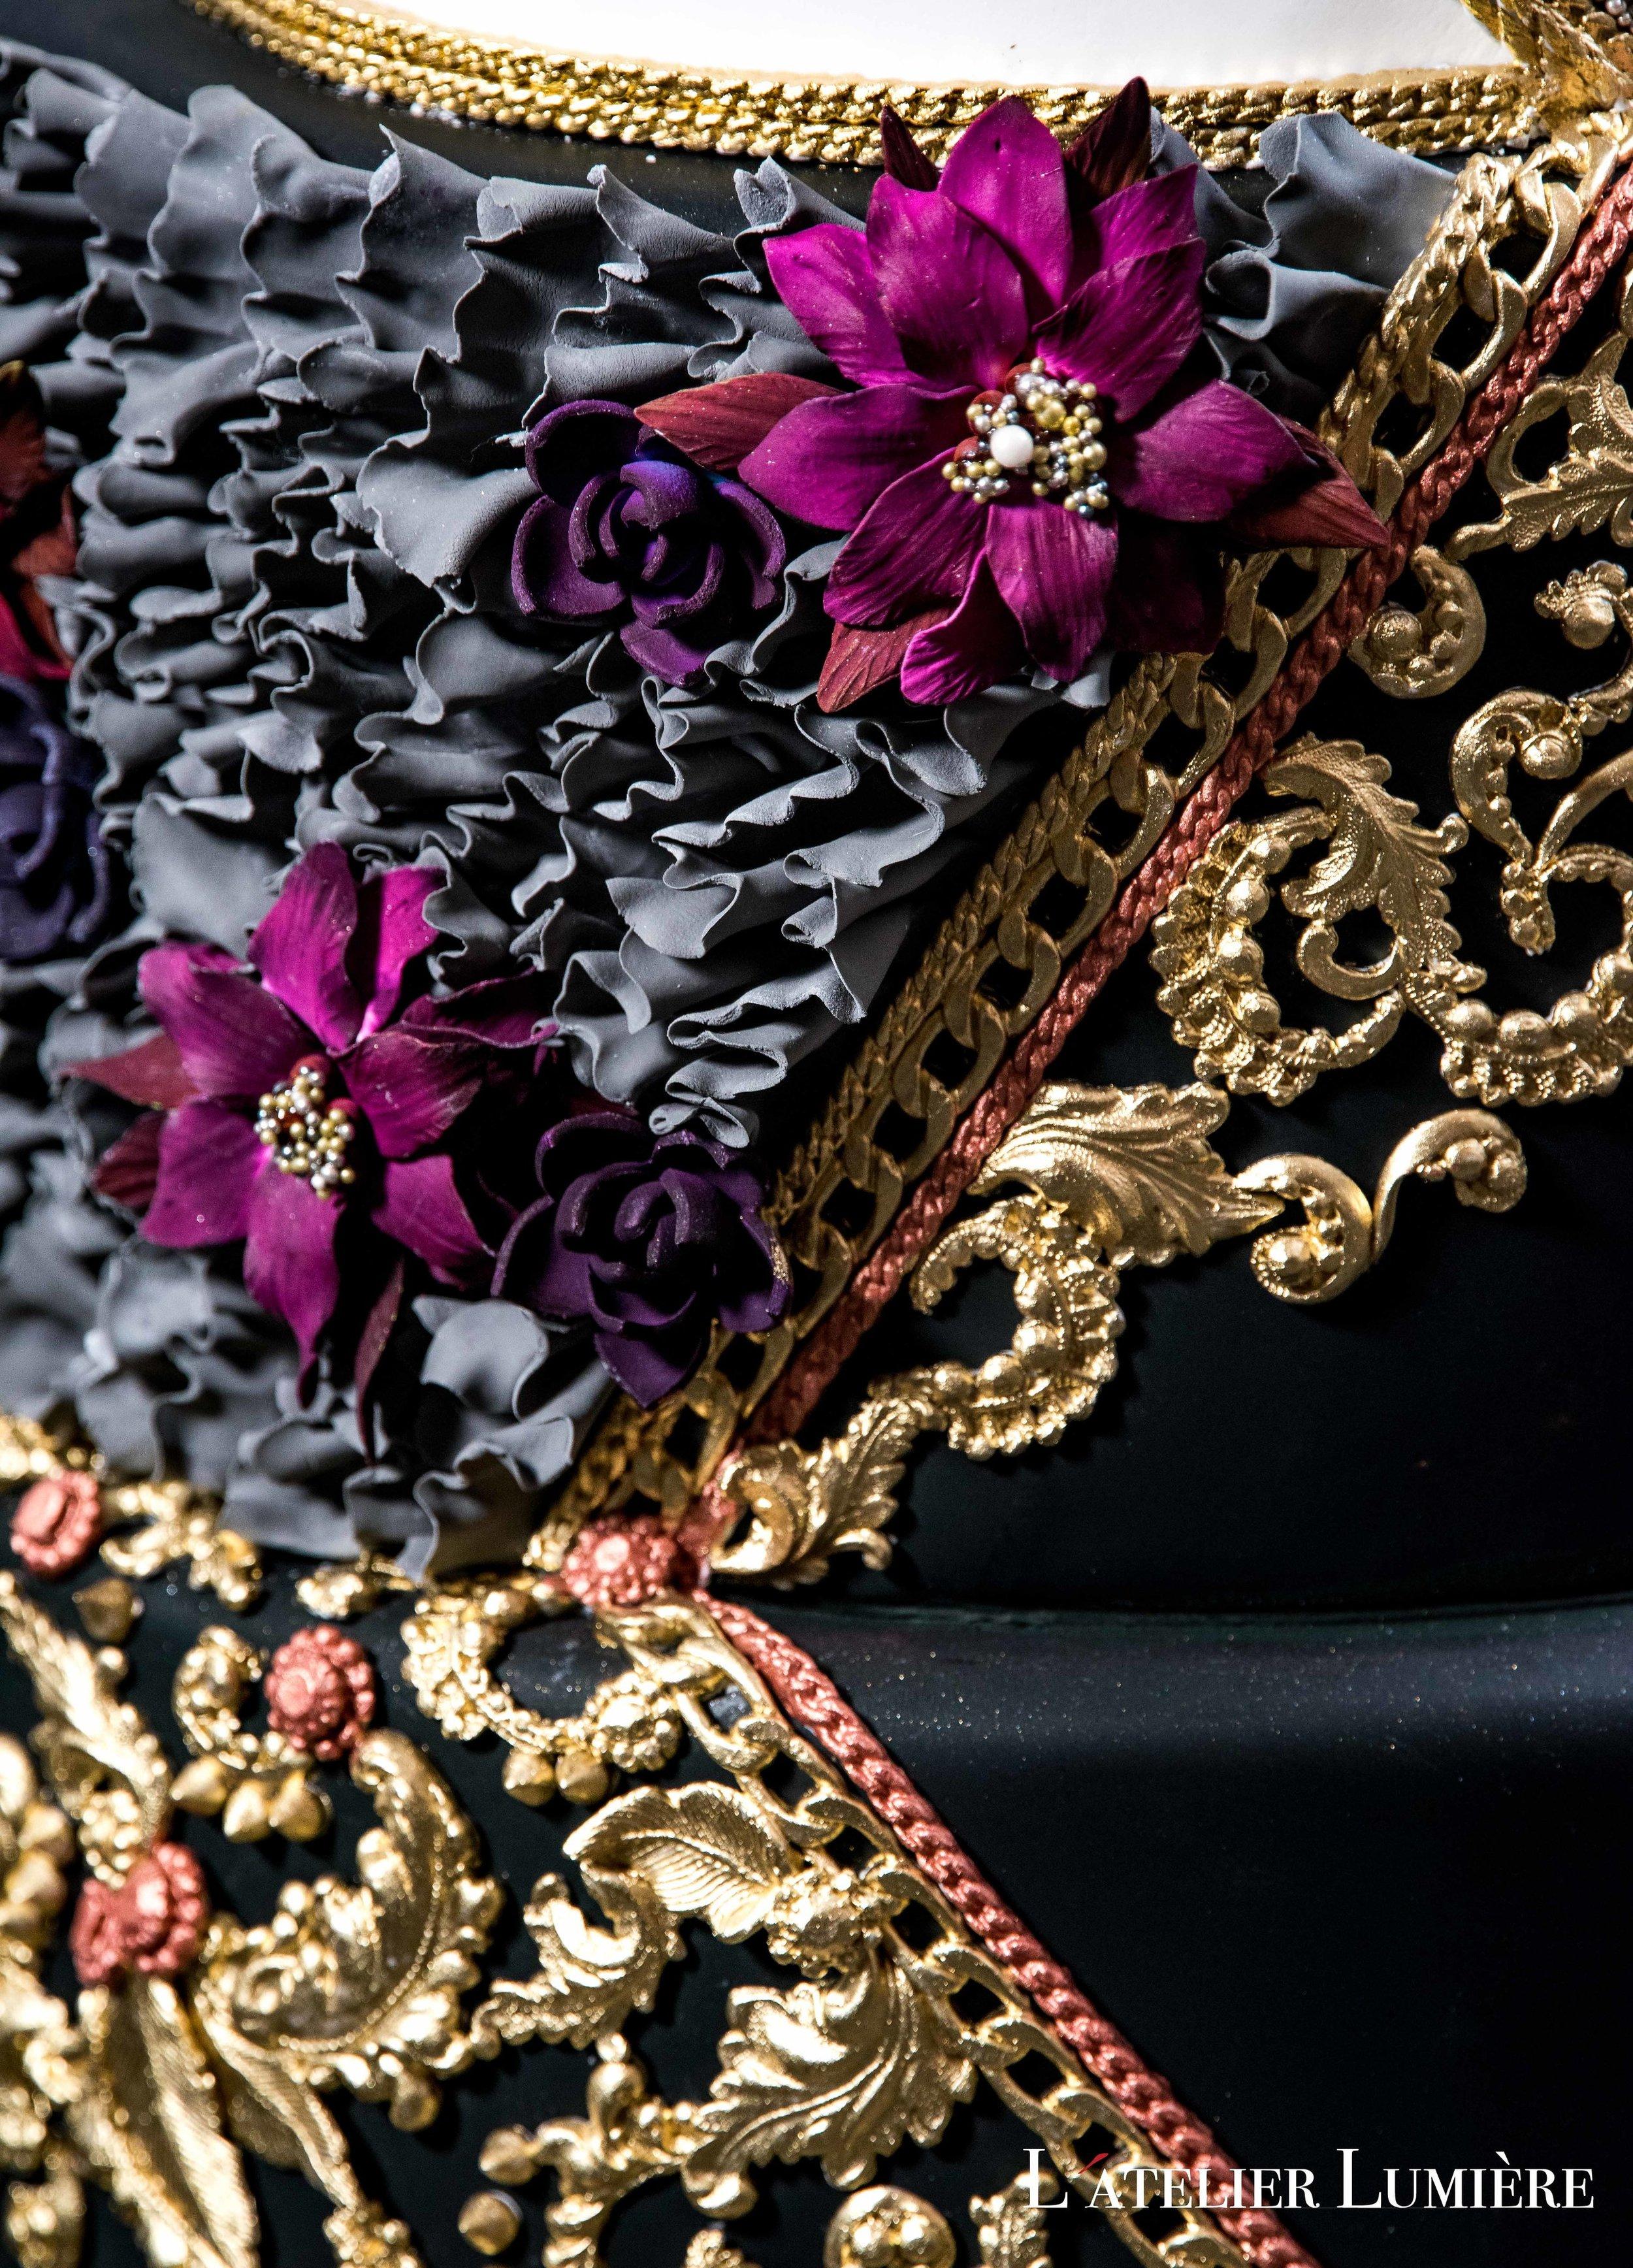 August In Bloom - Cake details - Riri (Grace Ormond Wedding)